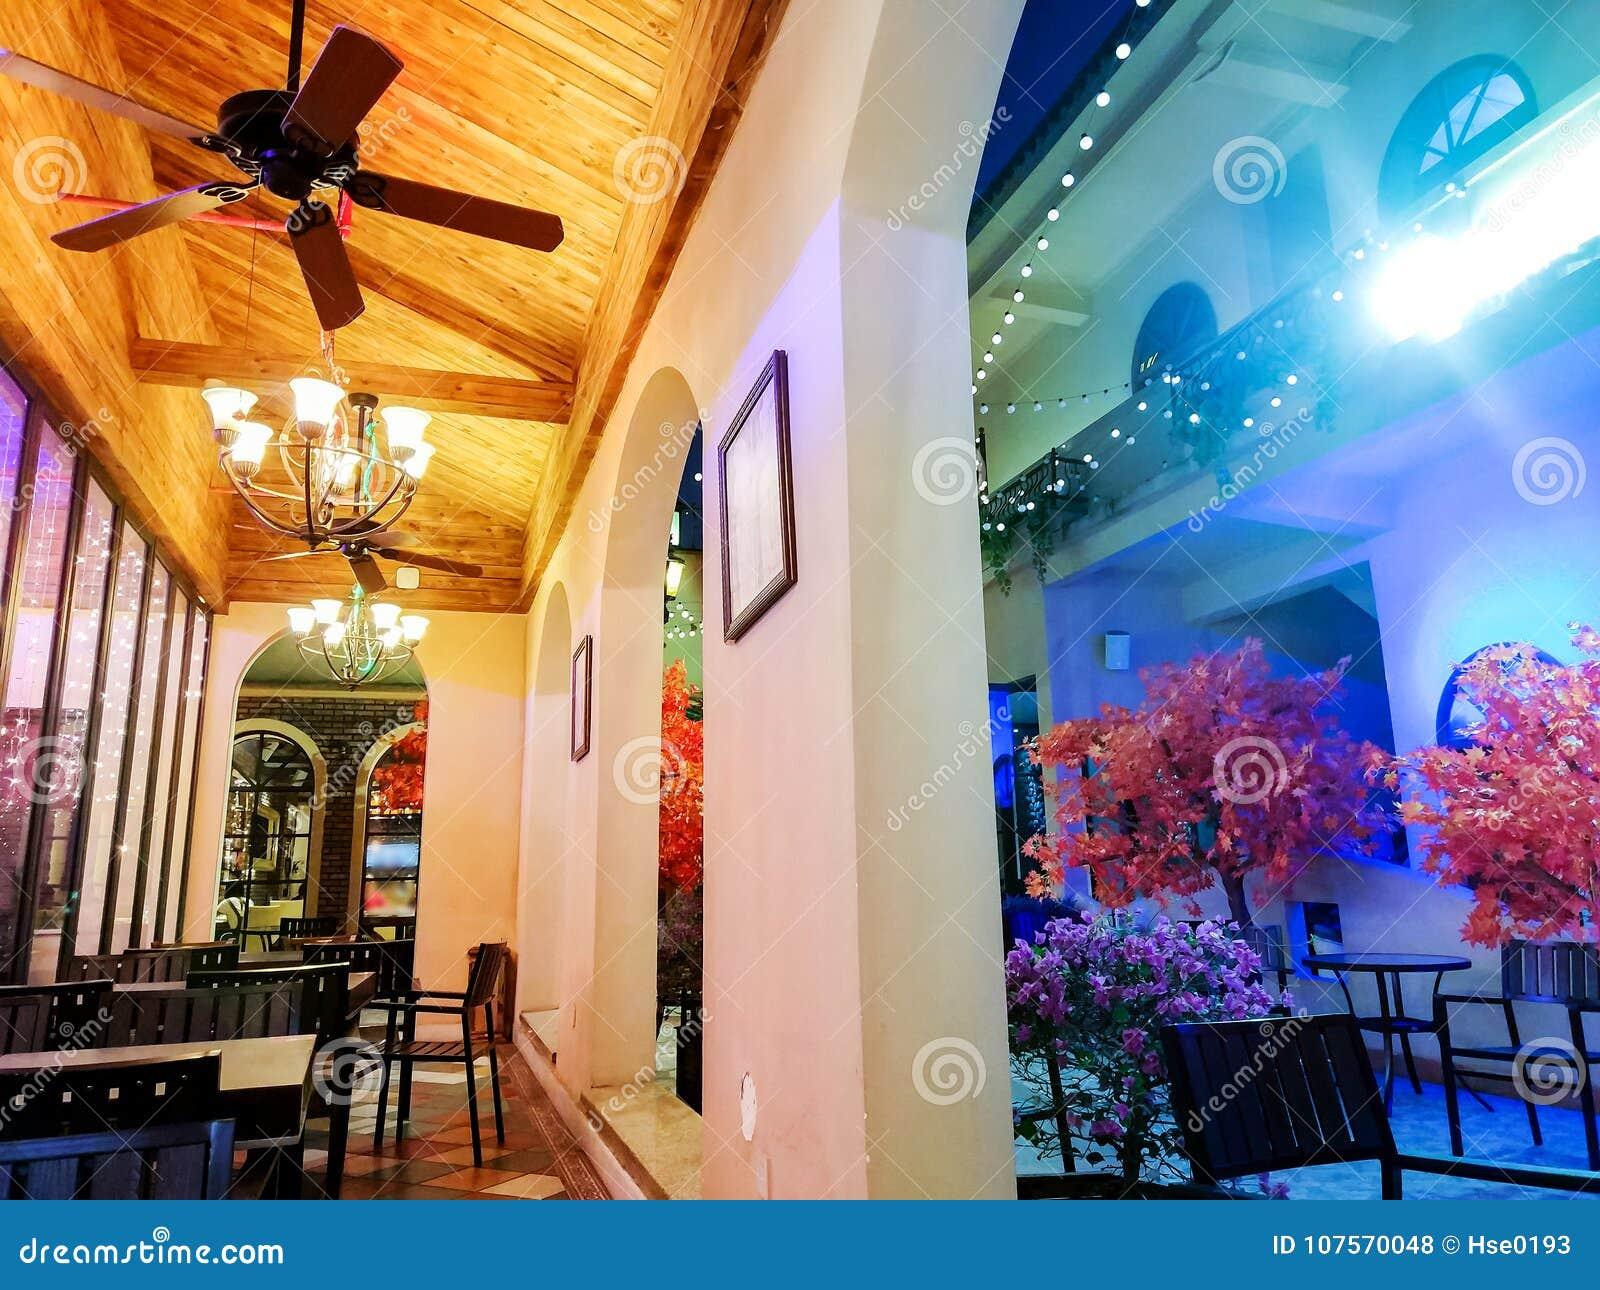 Tuscan Style Restaurant Stock Photo Image Of Cafe Patio